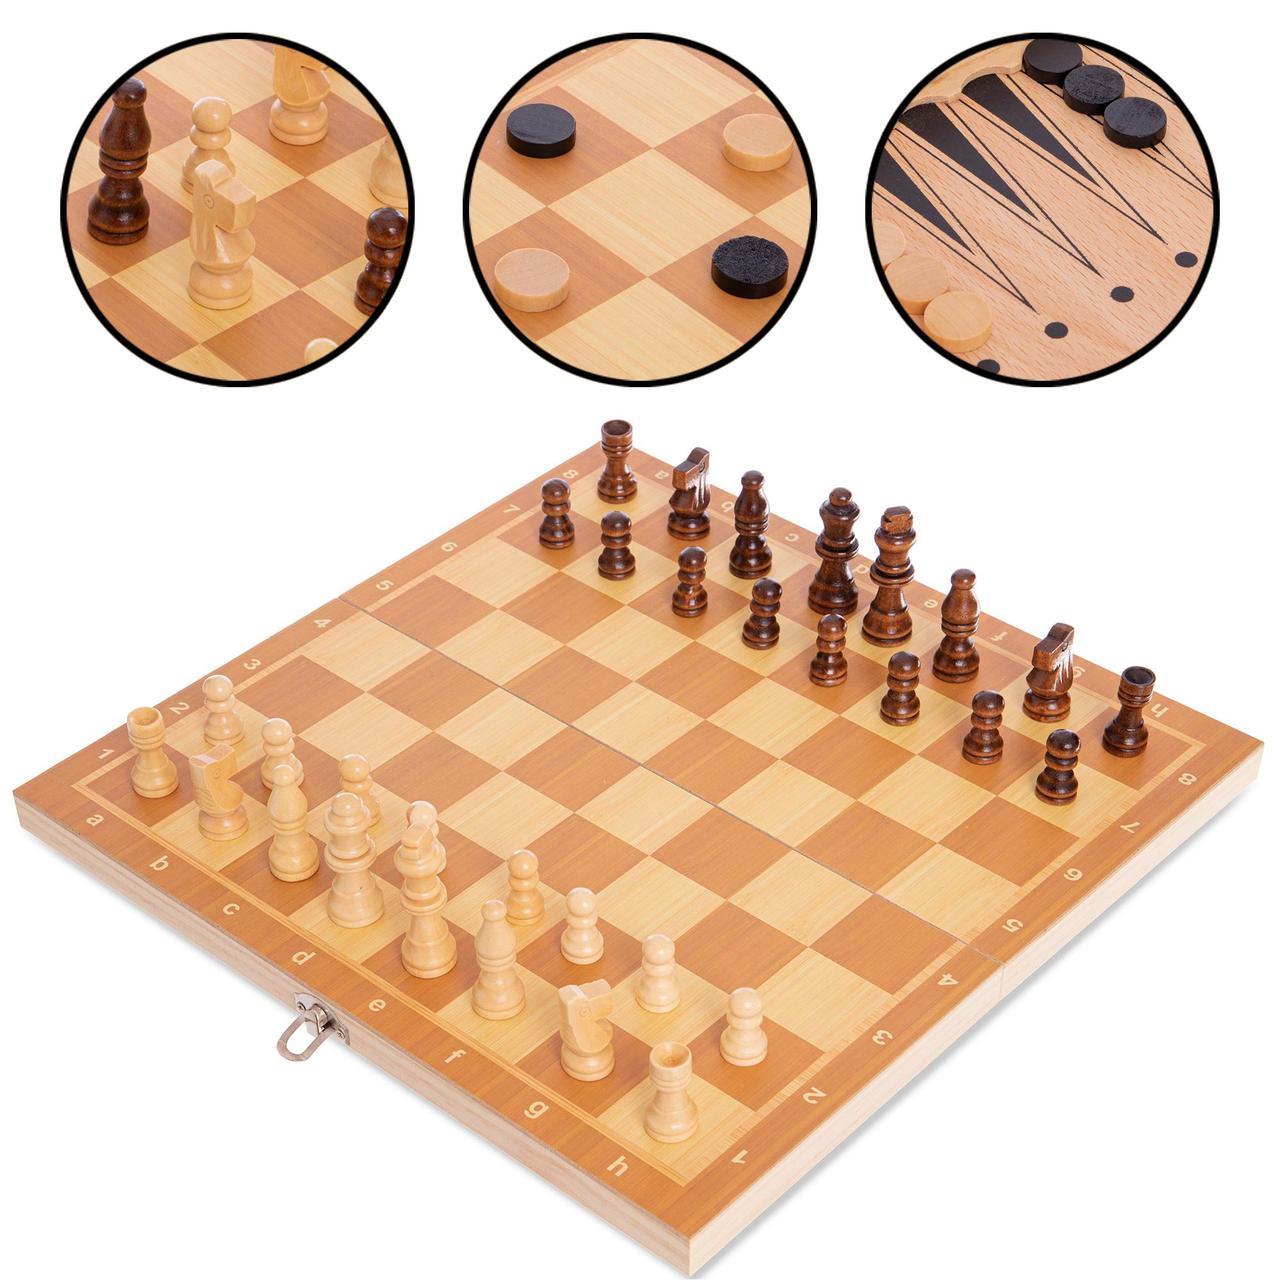 Шахматы, шашки, нарды 3 в 1 деревянные 34 x 34 см W7723